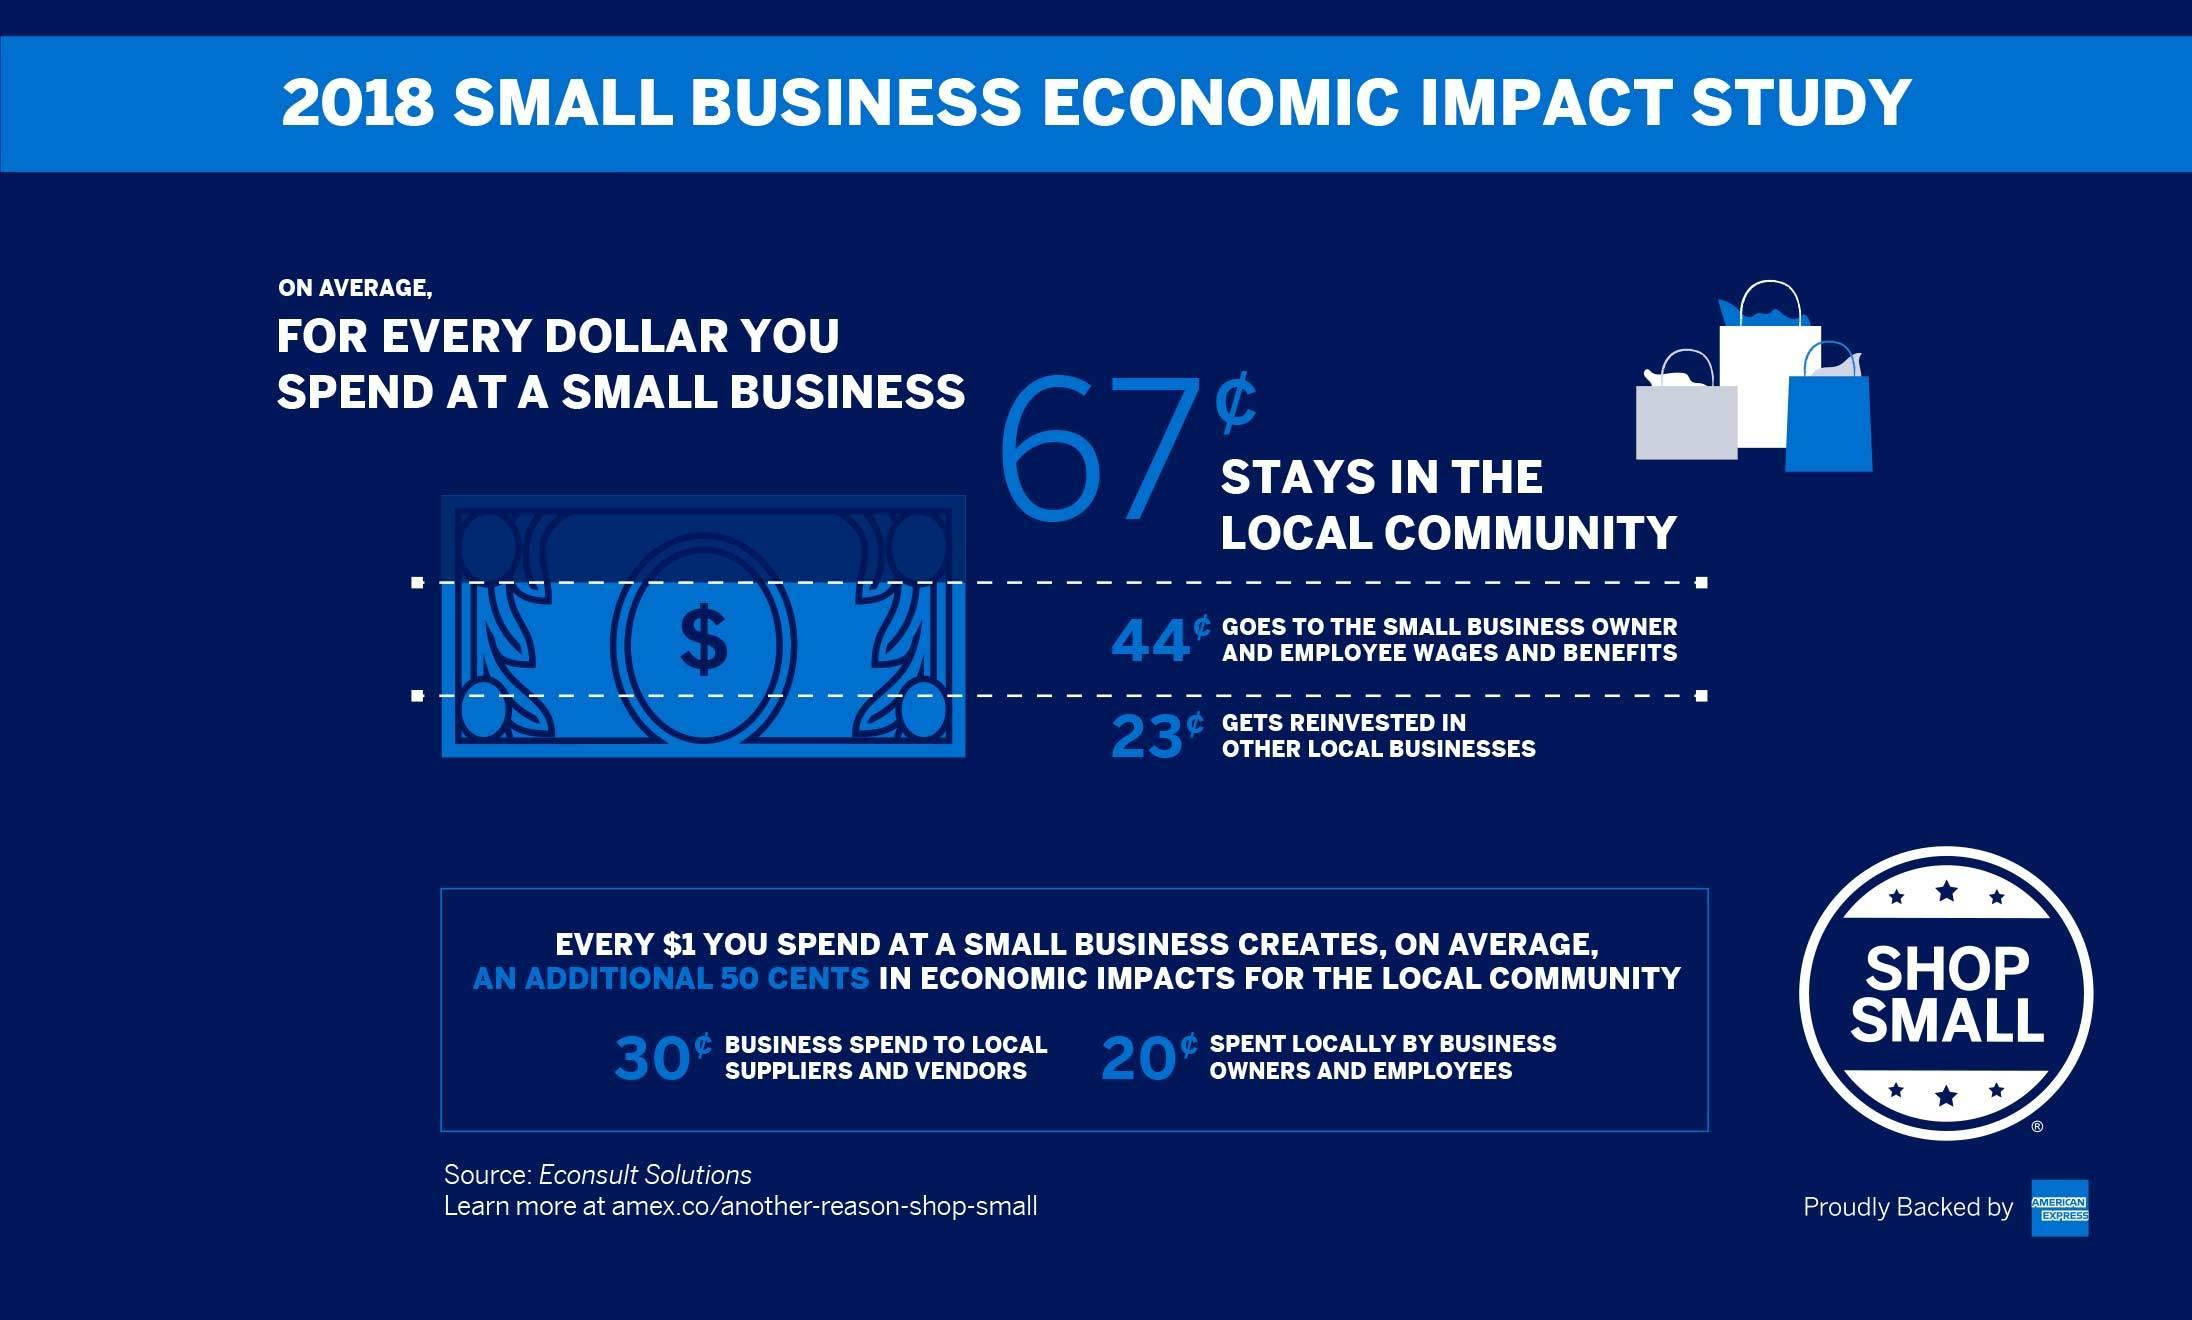 SBS_Infographic_FINAL.jpg